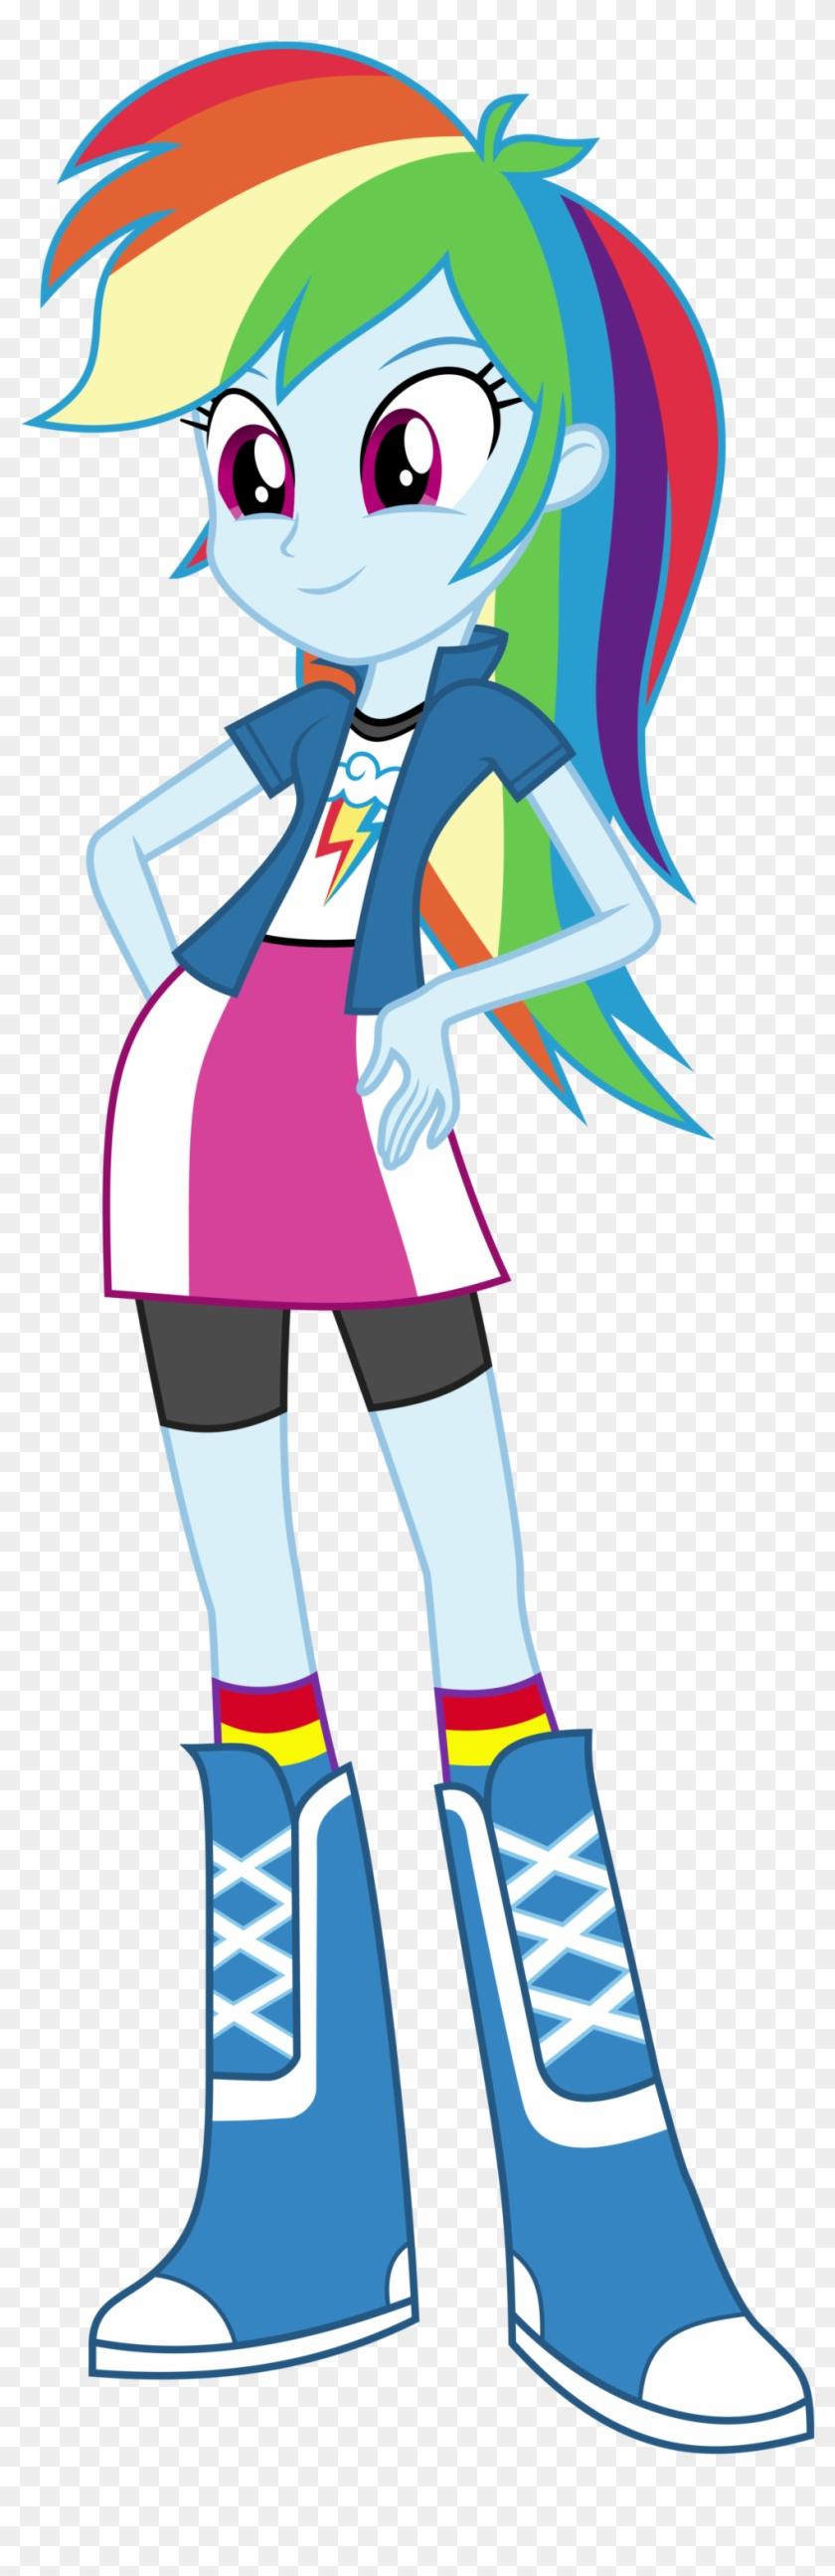 Rainbow Dash Deal With It Download - My Little Pony Equestria Girls Rainbow Dash #858101